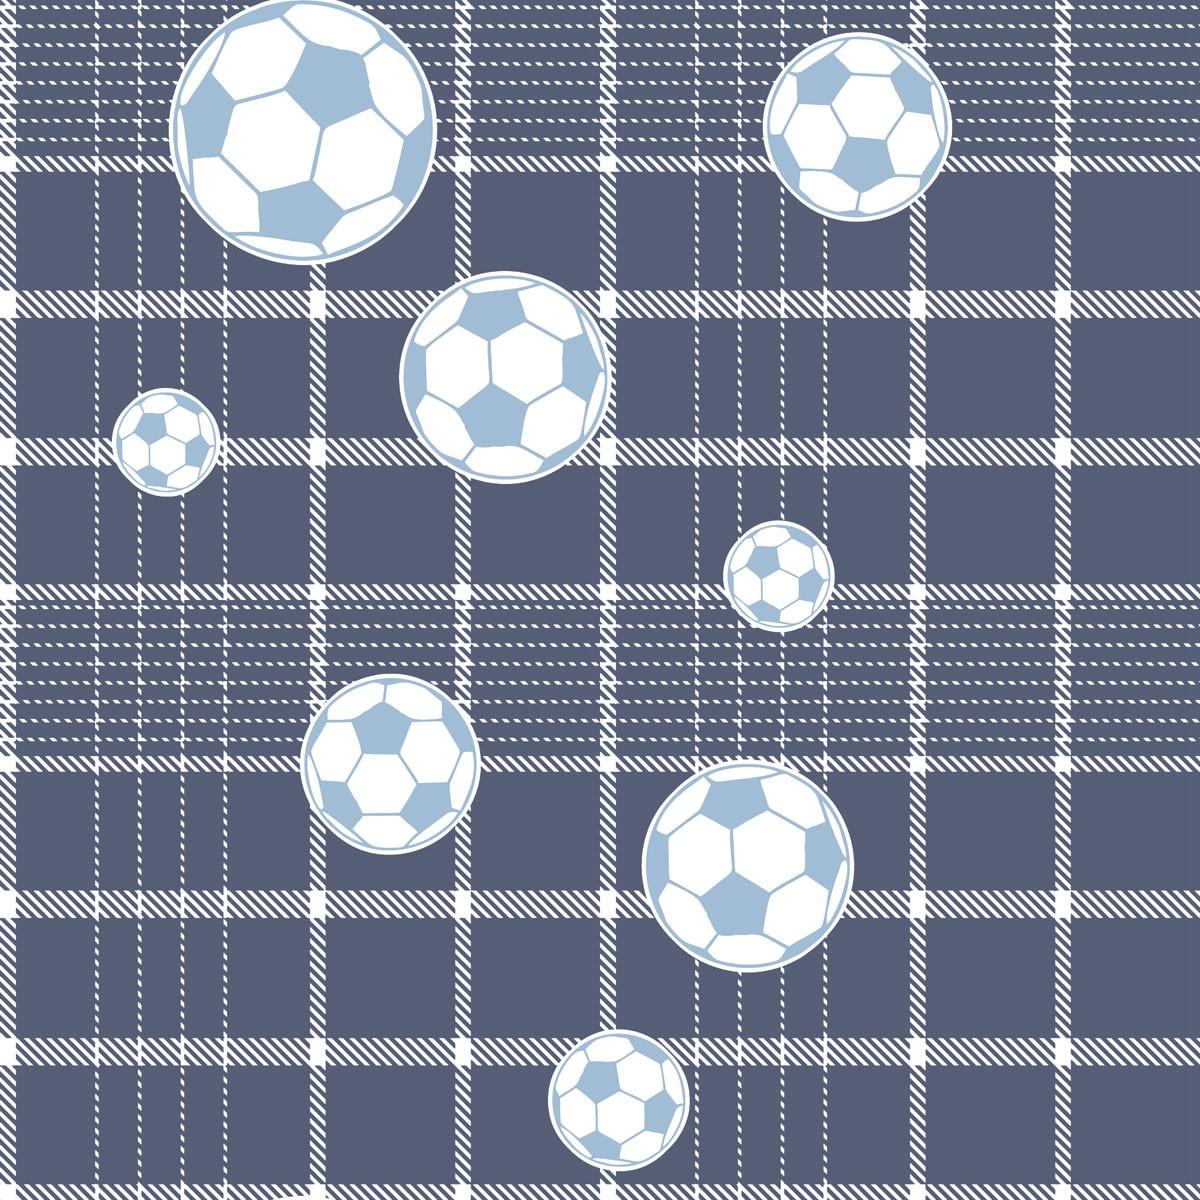 kinderzimmer tapeten fussball – reiquest